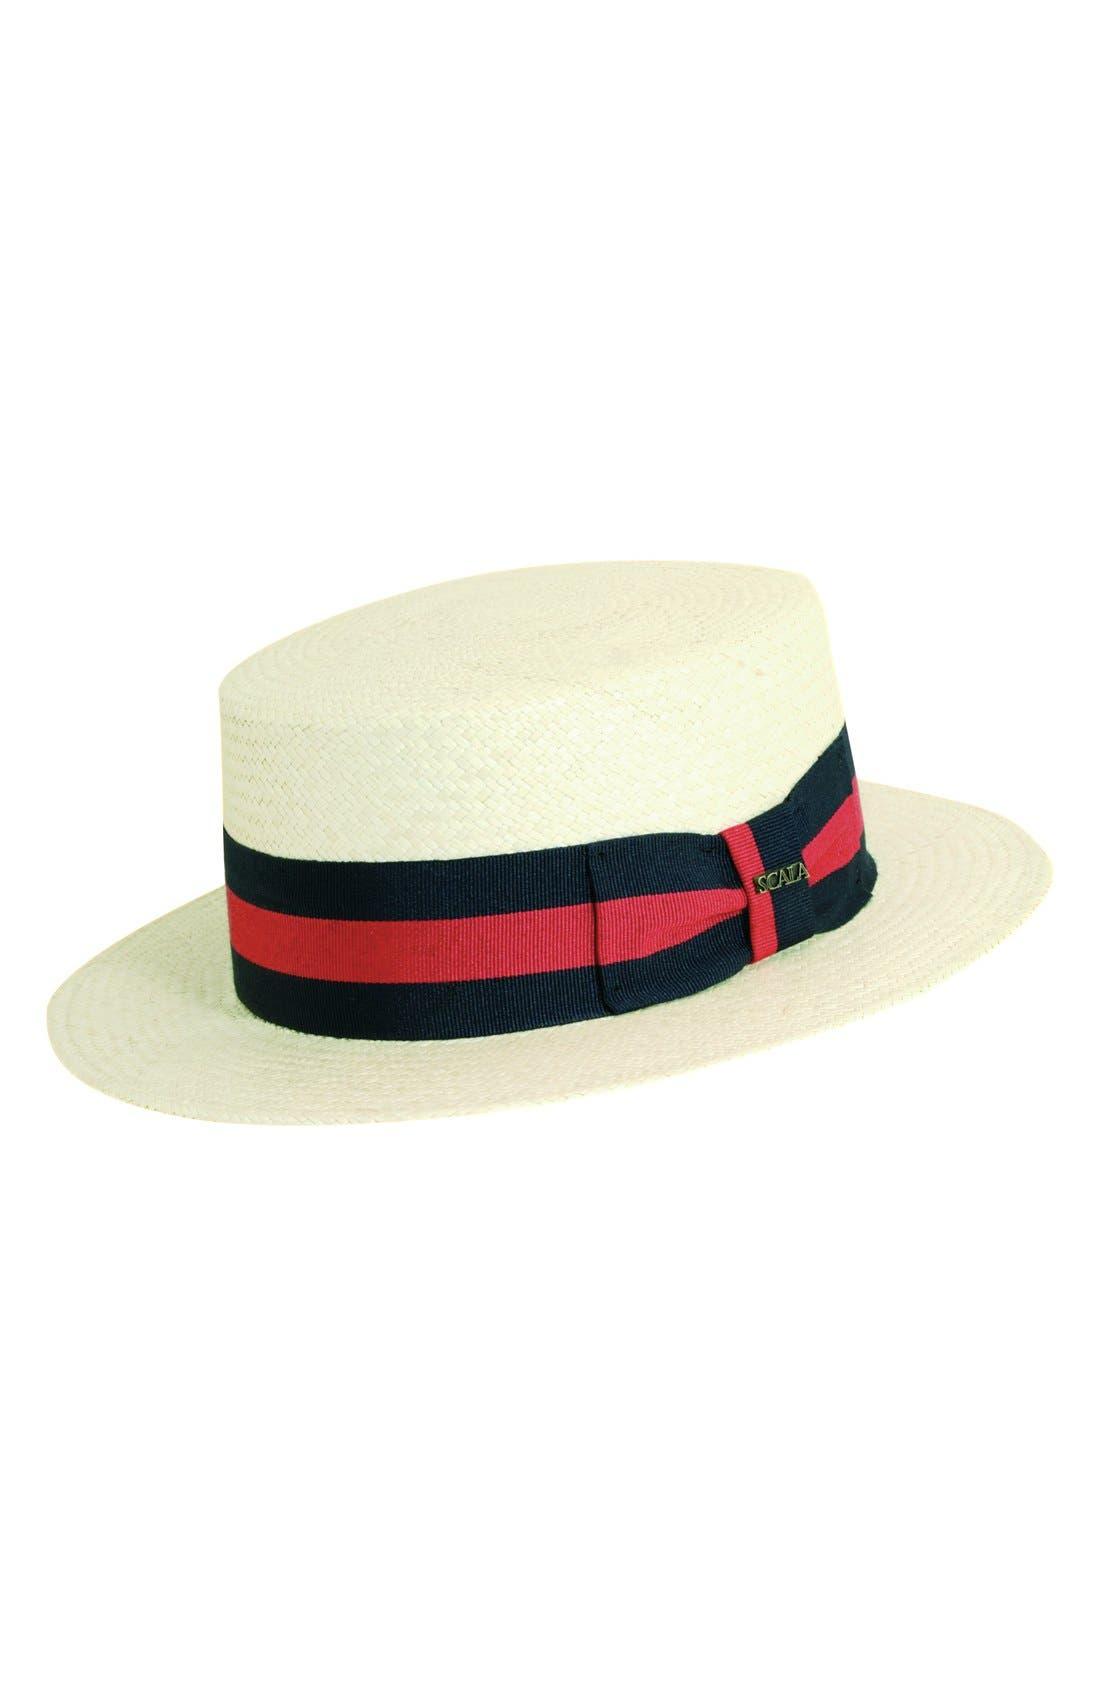 Alternate Image 1 Selected - Scala Panama Straw Boater Hat